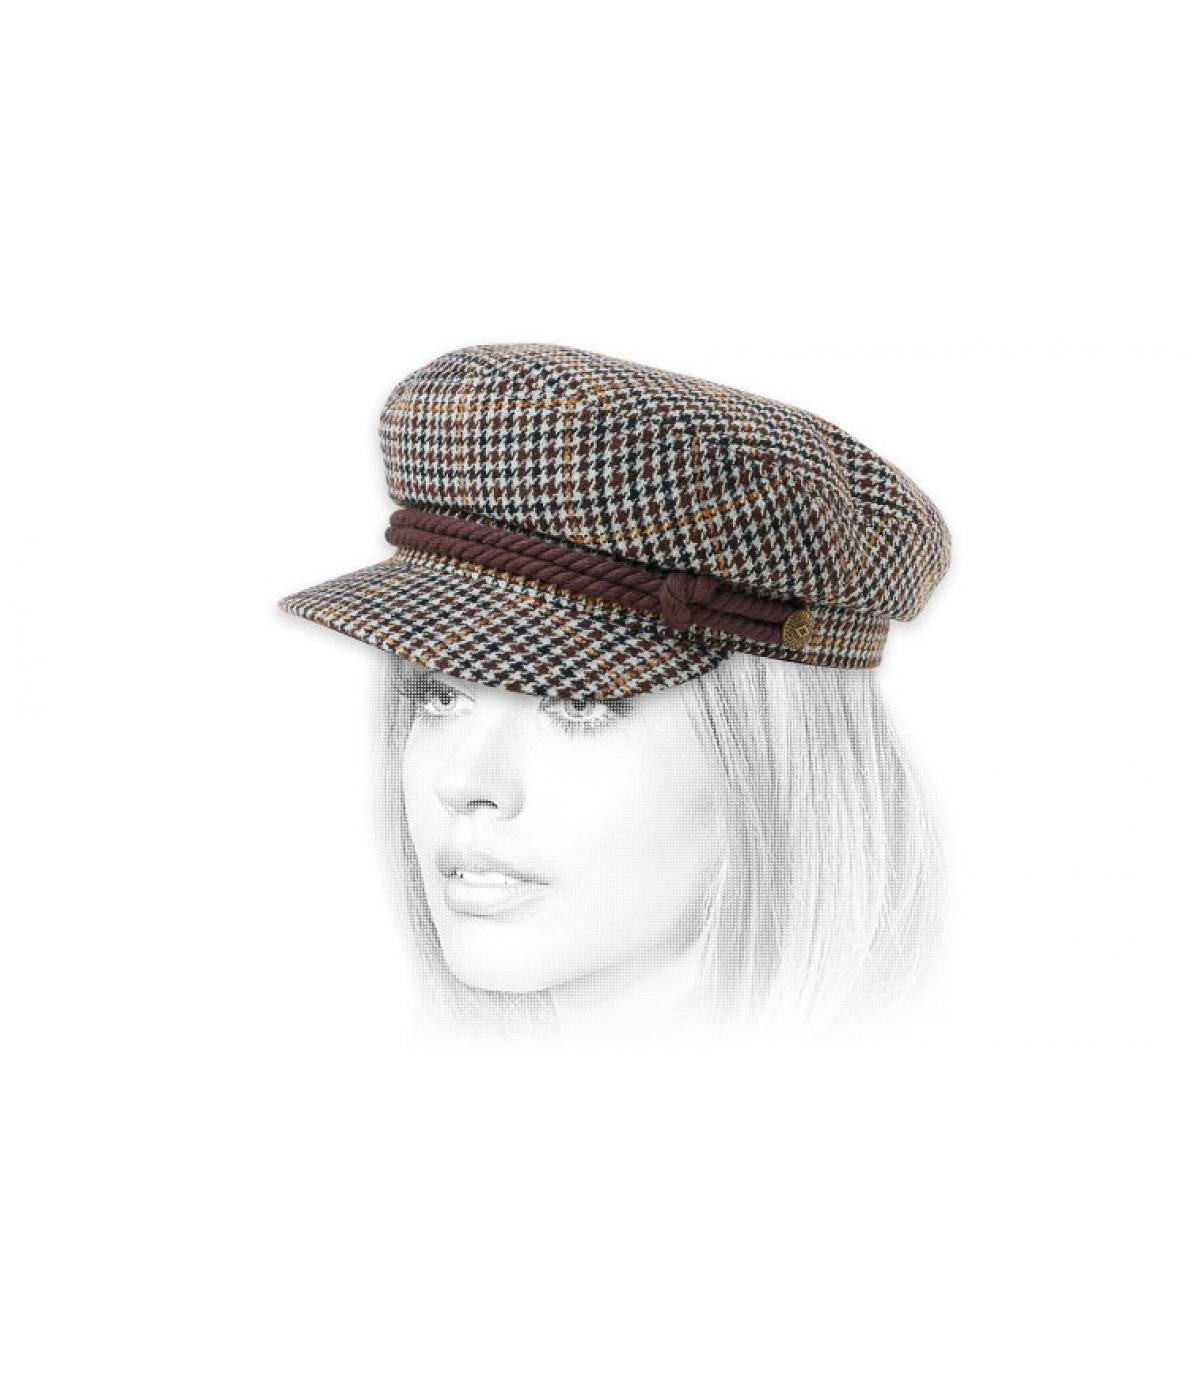 Brixton brown fisherman cap